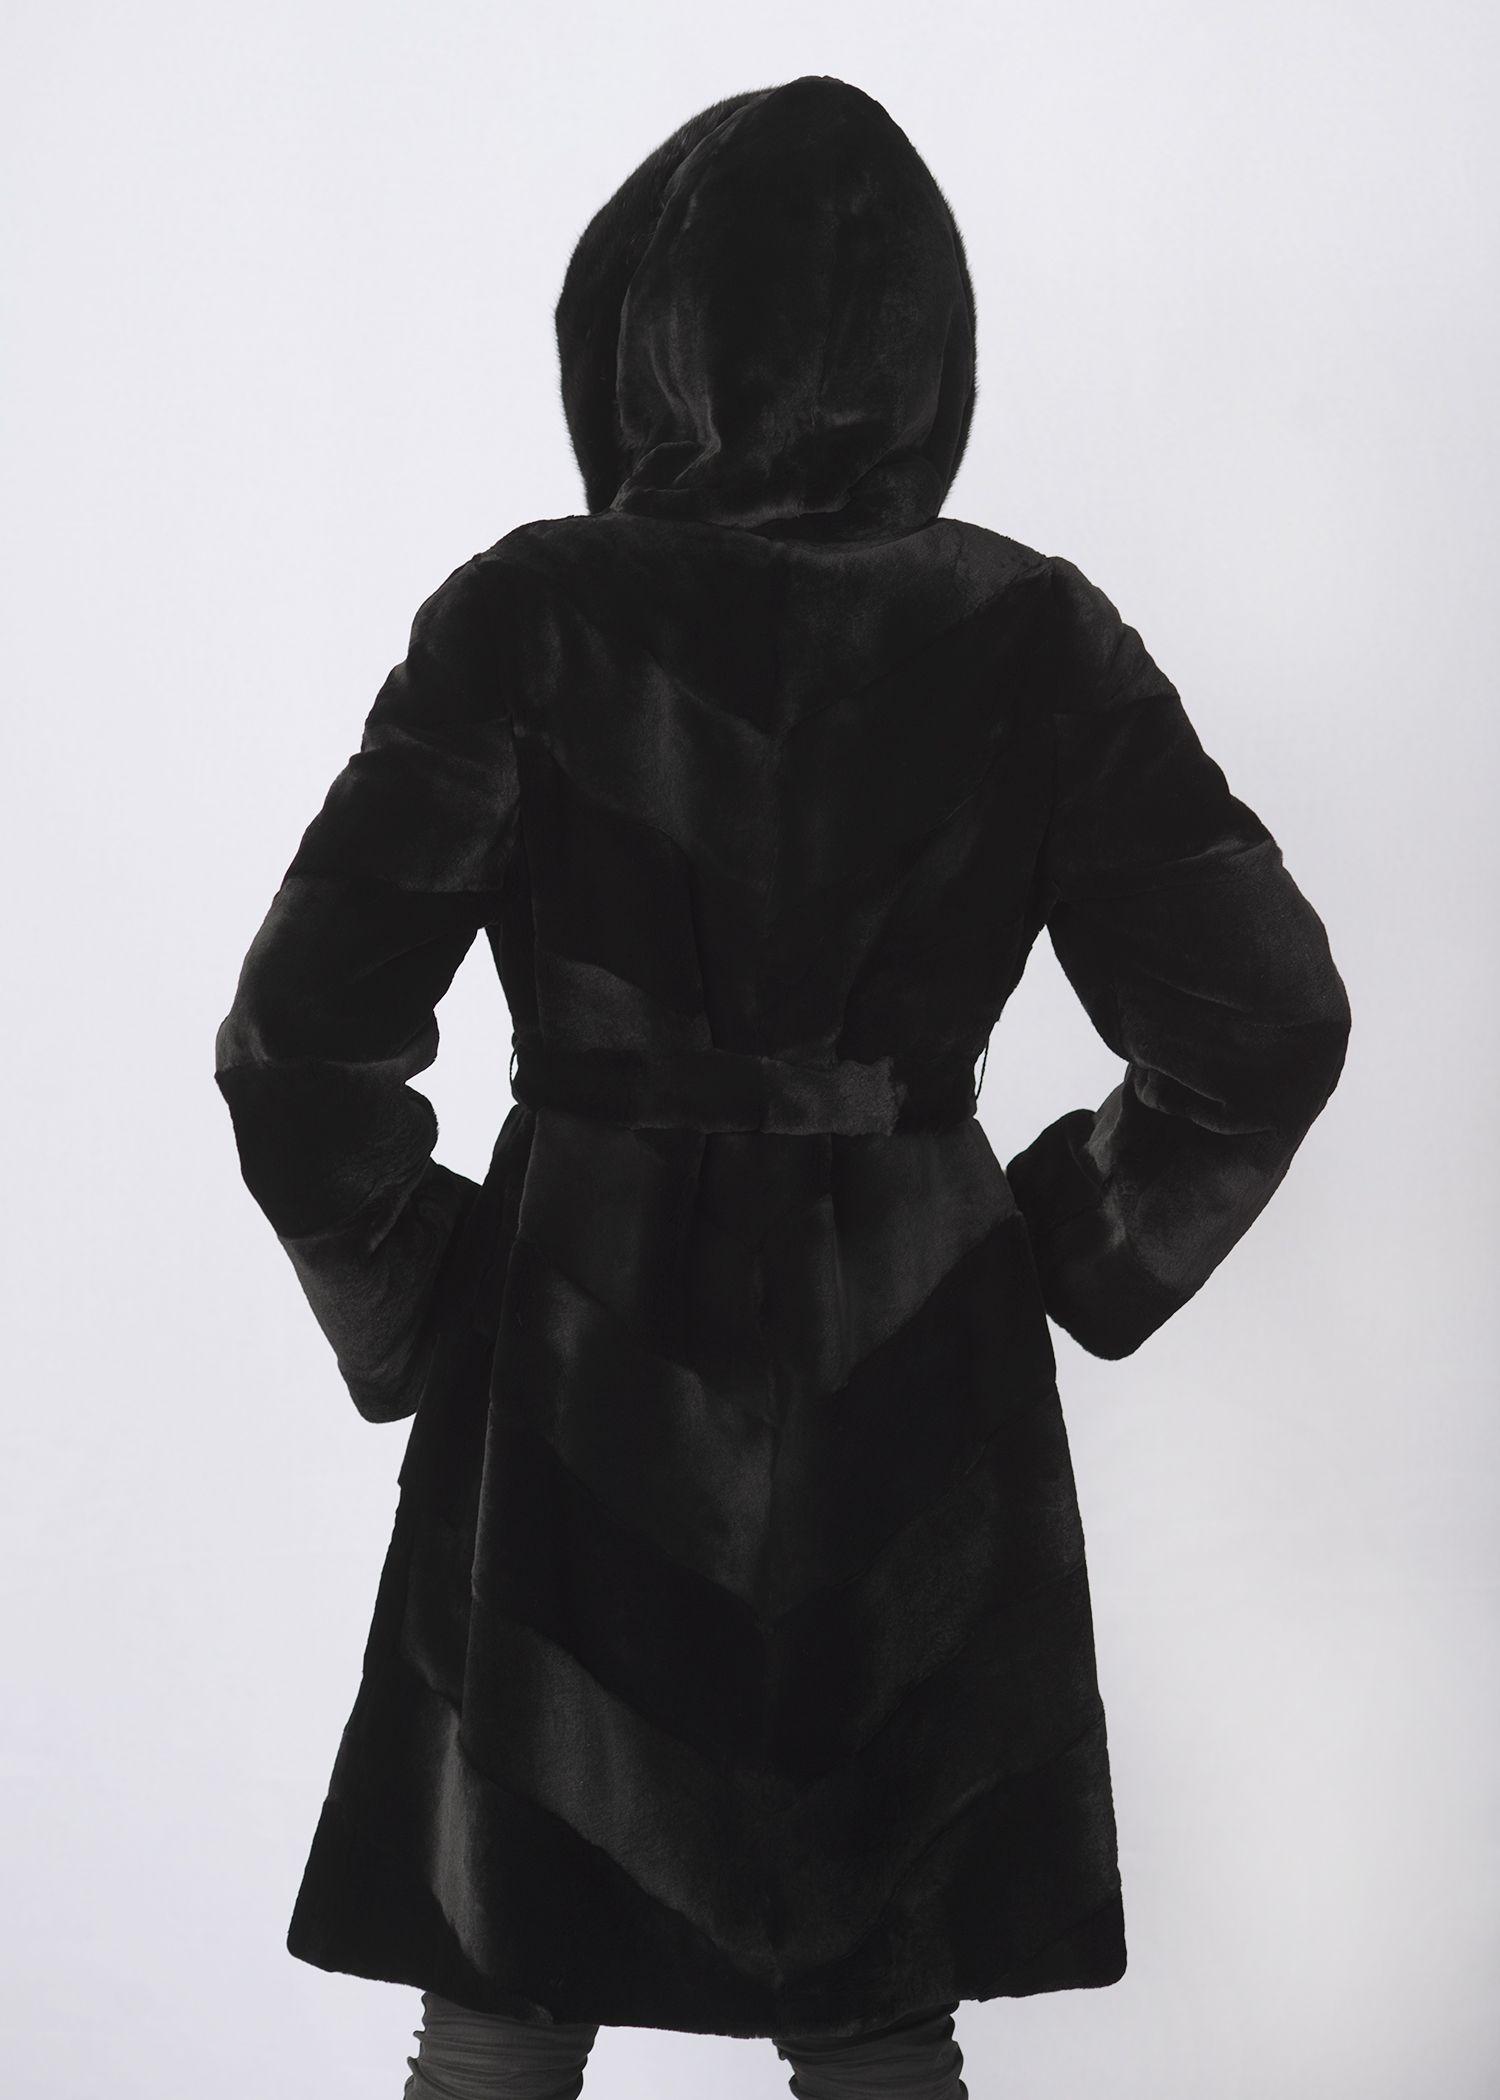 Шуба женская из бобрика(rex) 300578 фото №1